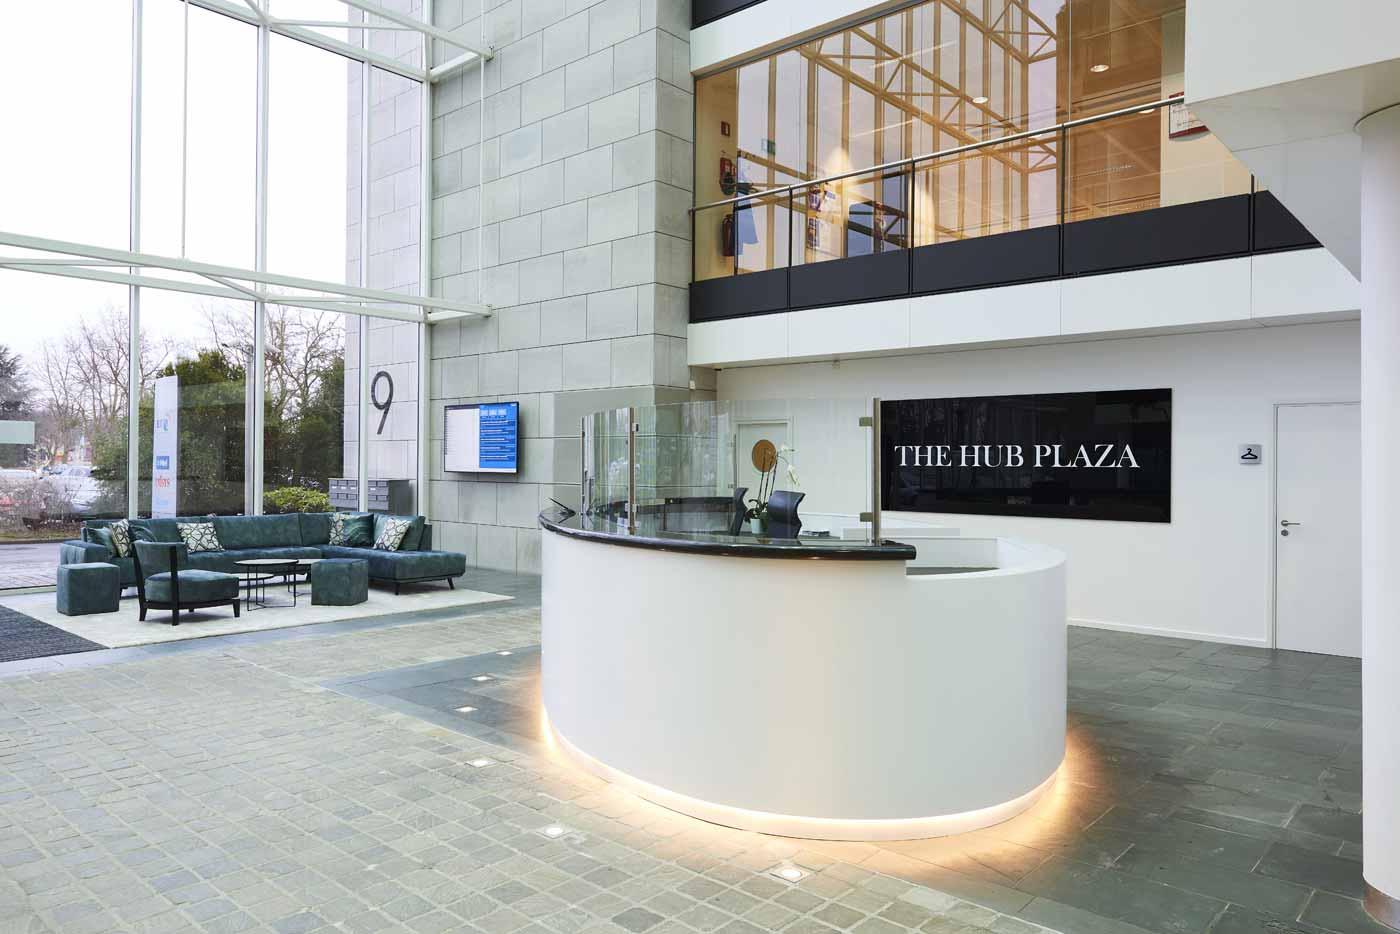 The Hub Plaza